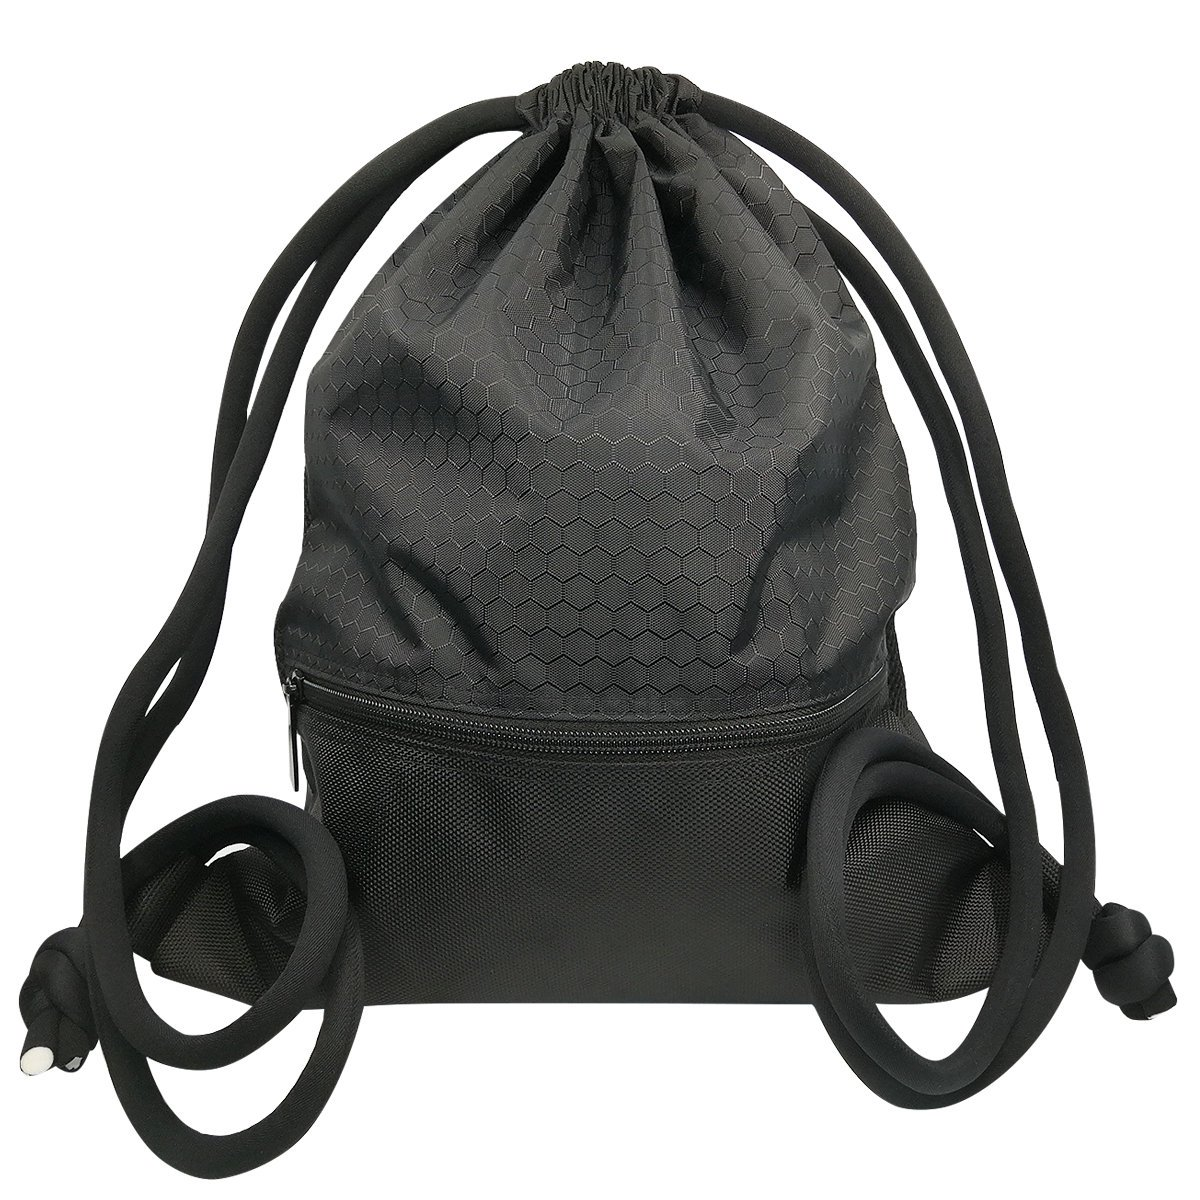 Mochila de Cordón Bolsa de Cuerdas Coolzon® Unisex Saco Deporte Bolso Gimnasio de Nylon con Bolsillo Grande de Cremallera para Adultos y Niños 50x42cm/ 19.7x16.5 (Negro)